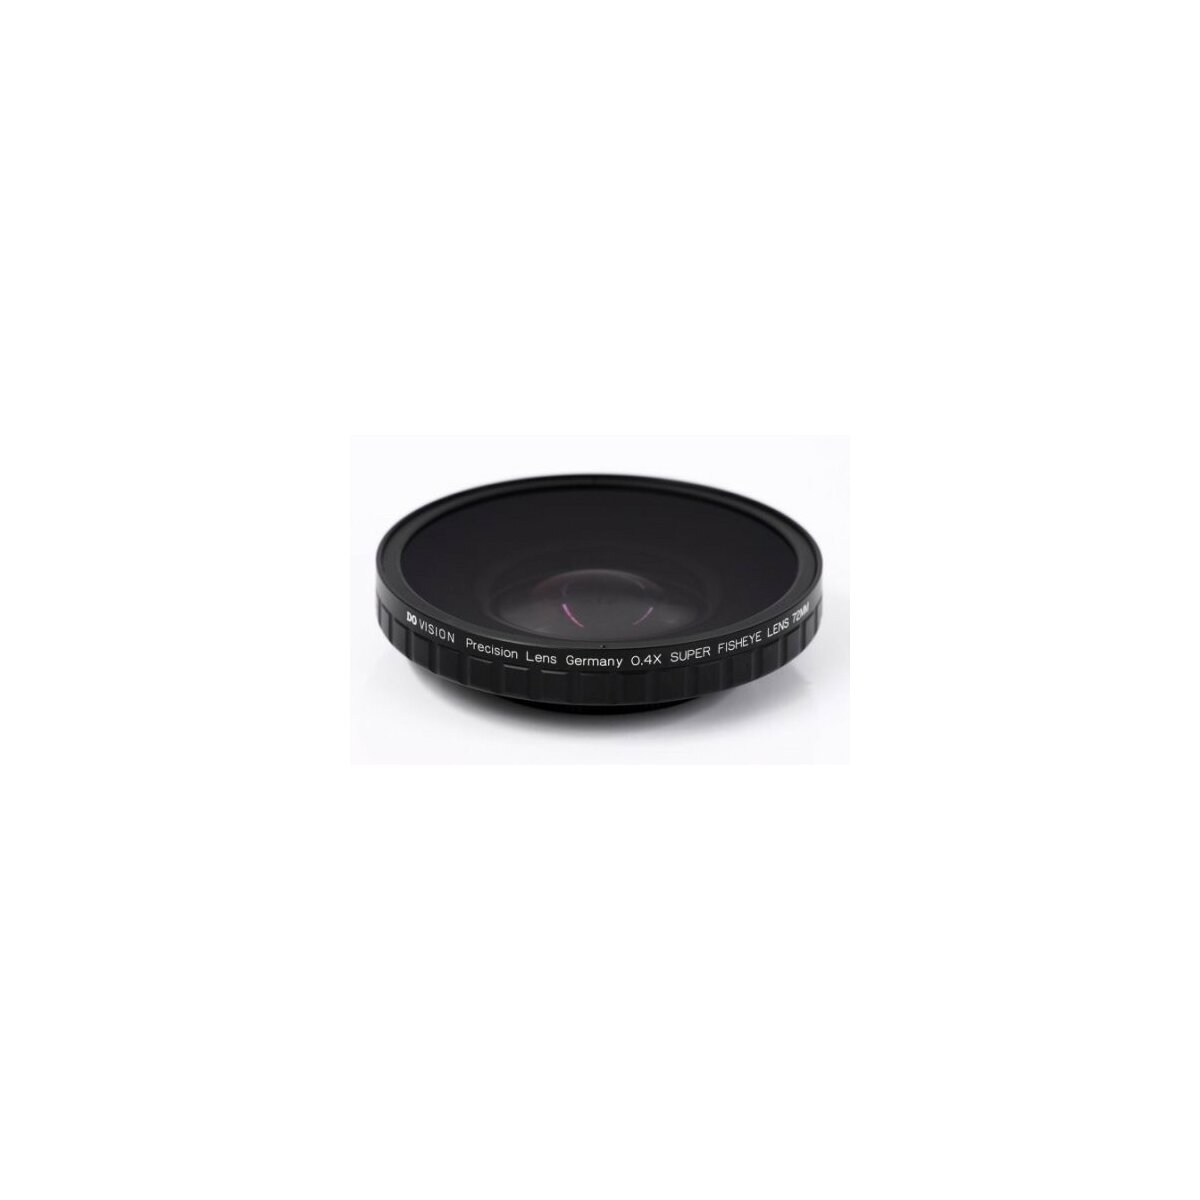 0.4x HD Fisheye 82mm Profi Broadcastlinse